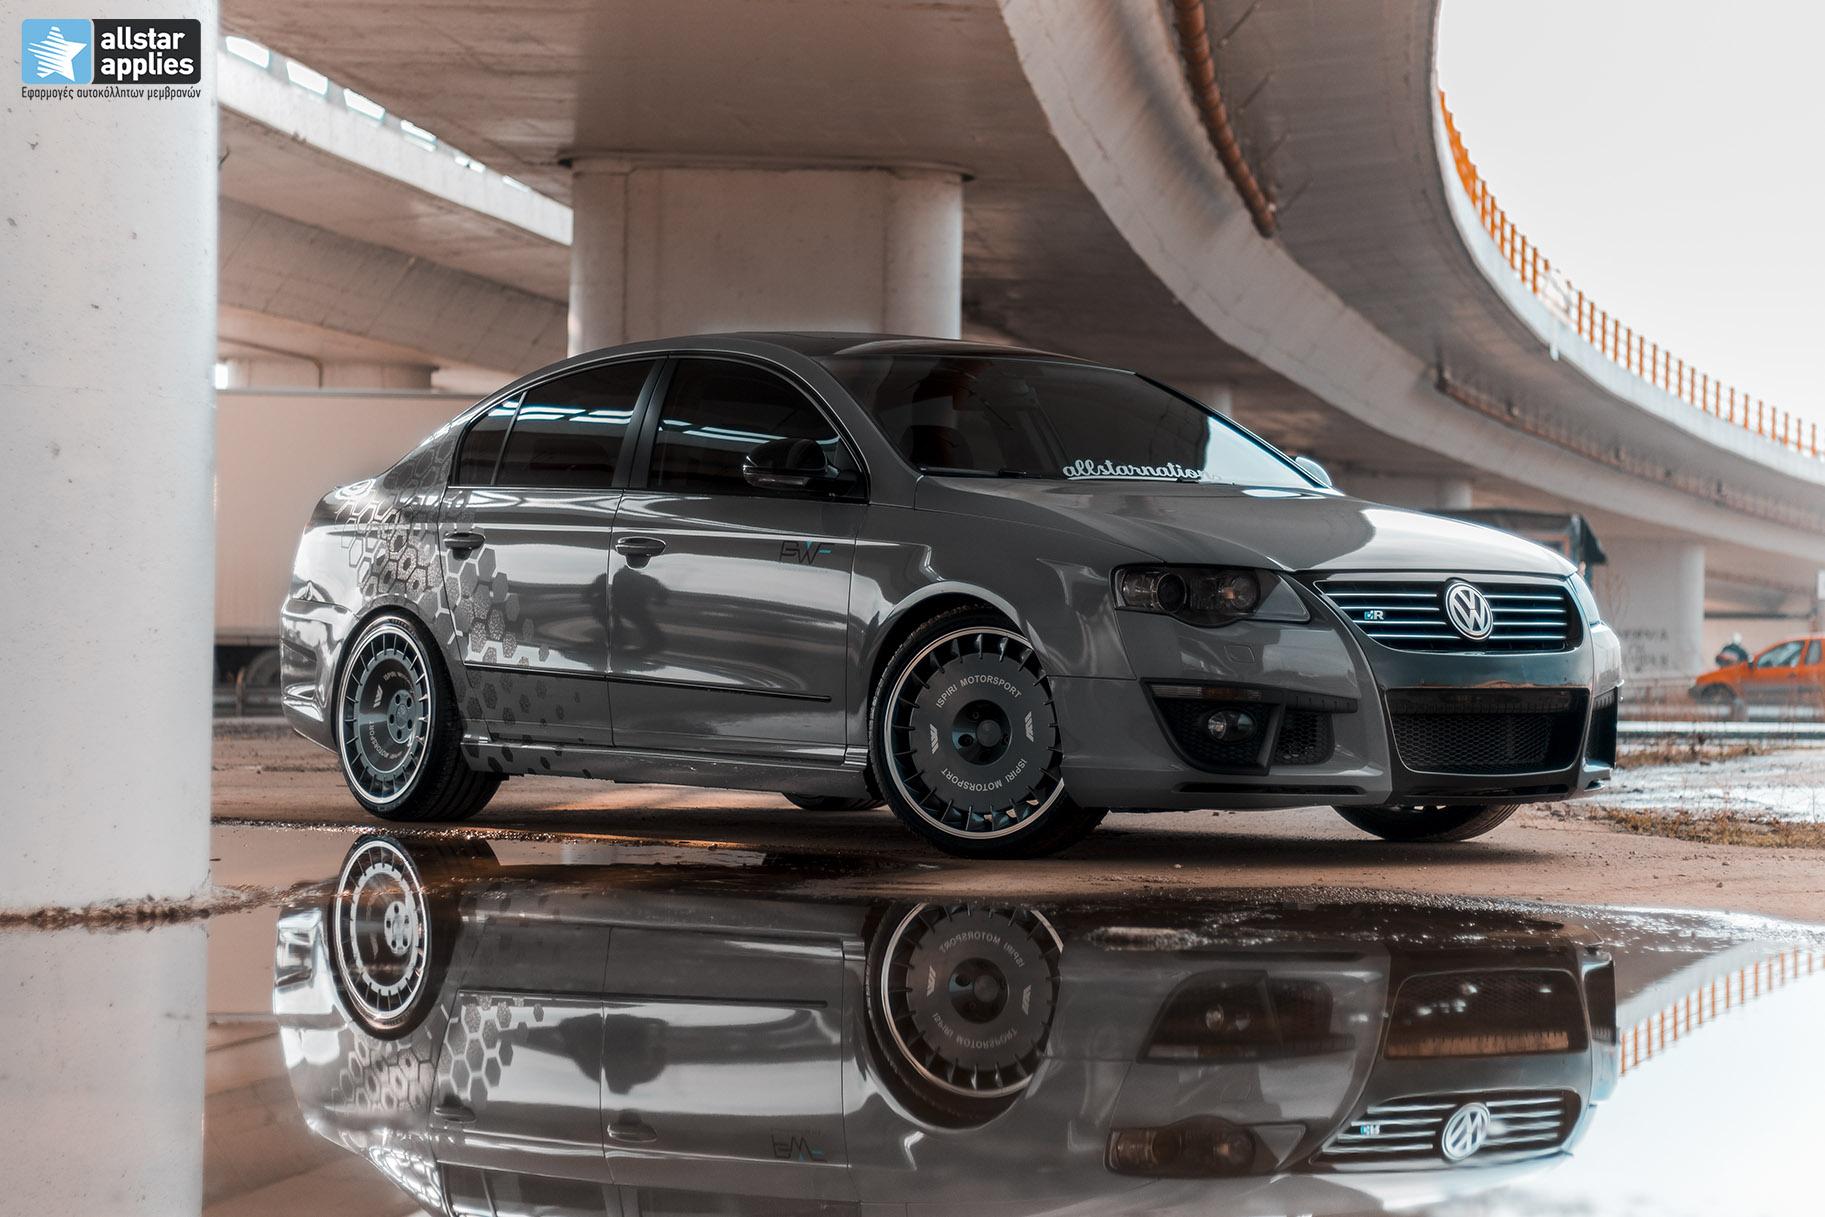 VW Passat - Nardo grey + honeycomb design 1